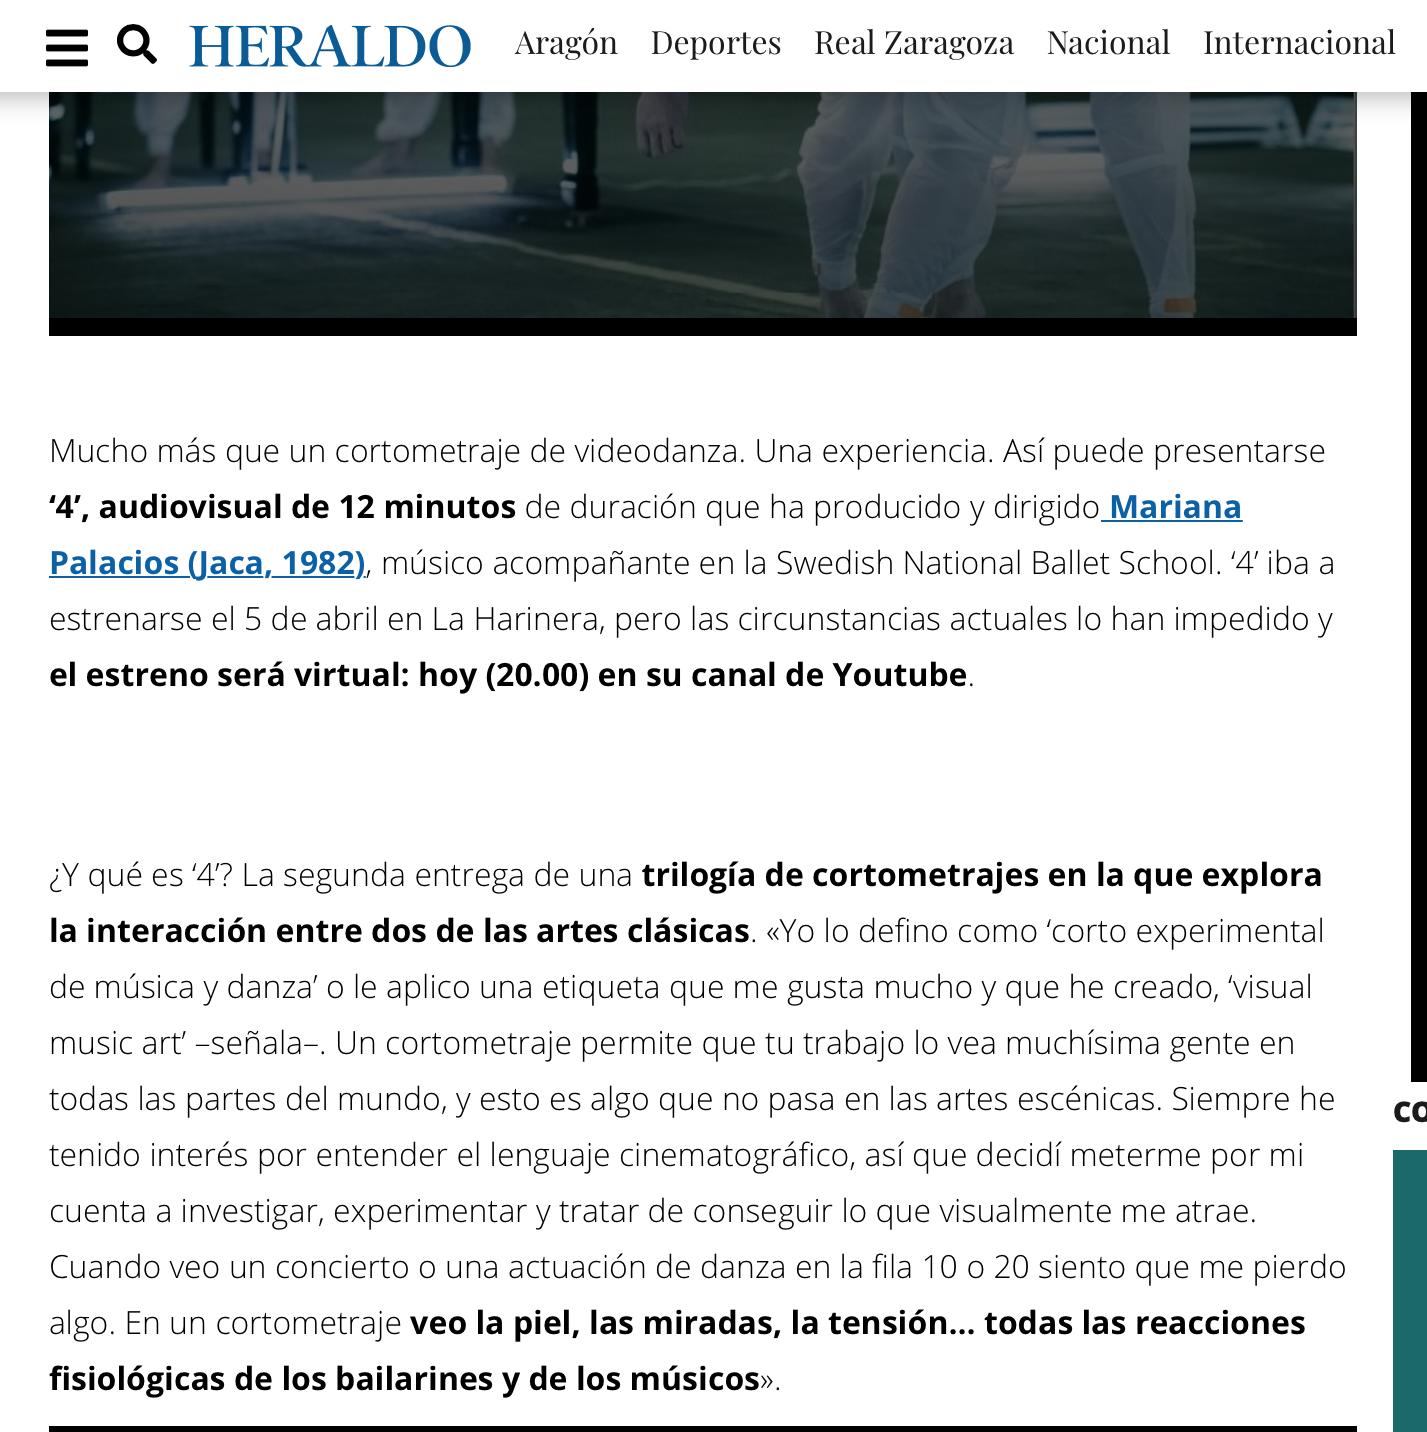 Heraldo 2 Screenshot 2021-05-02 at 20.18.58